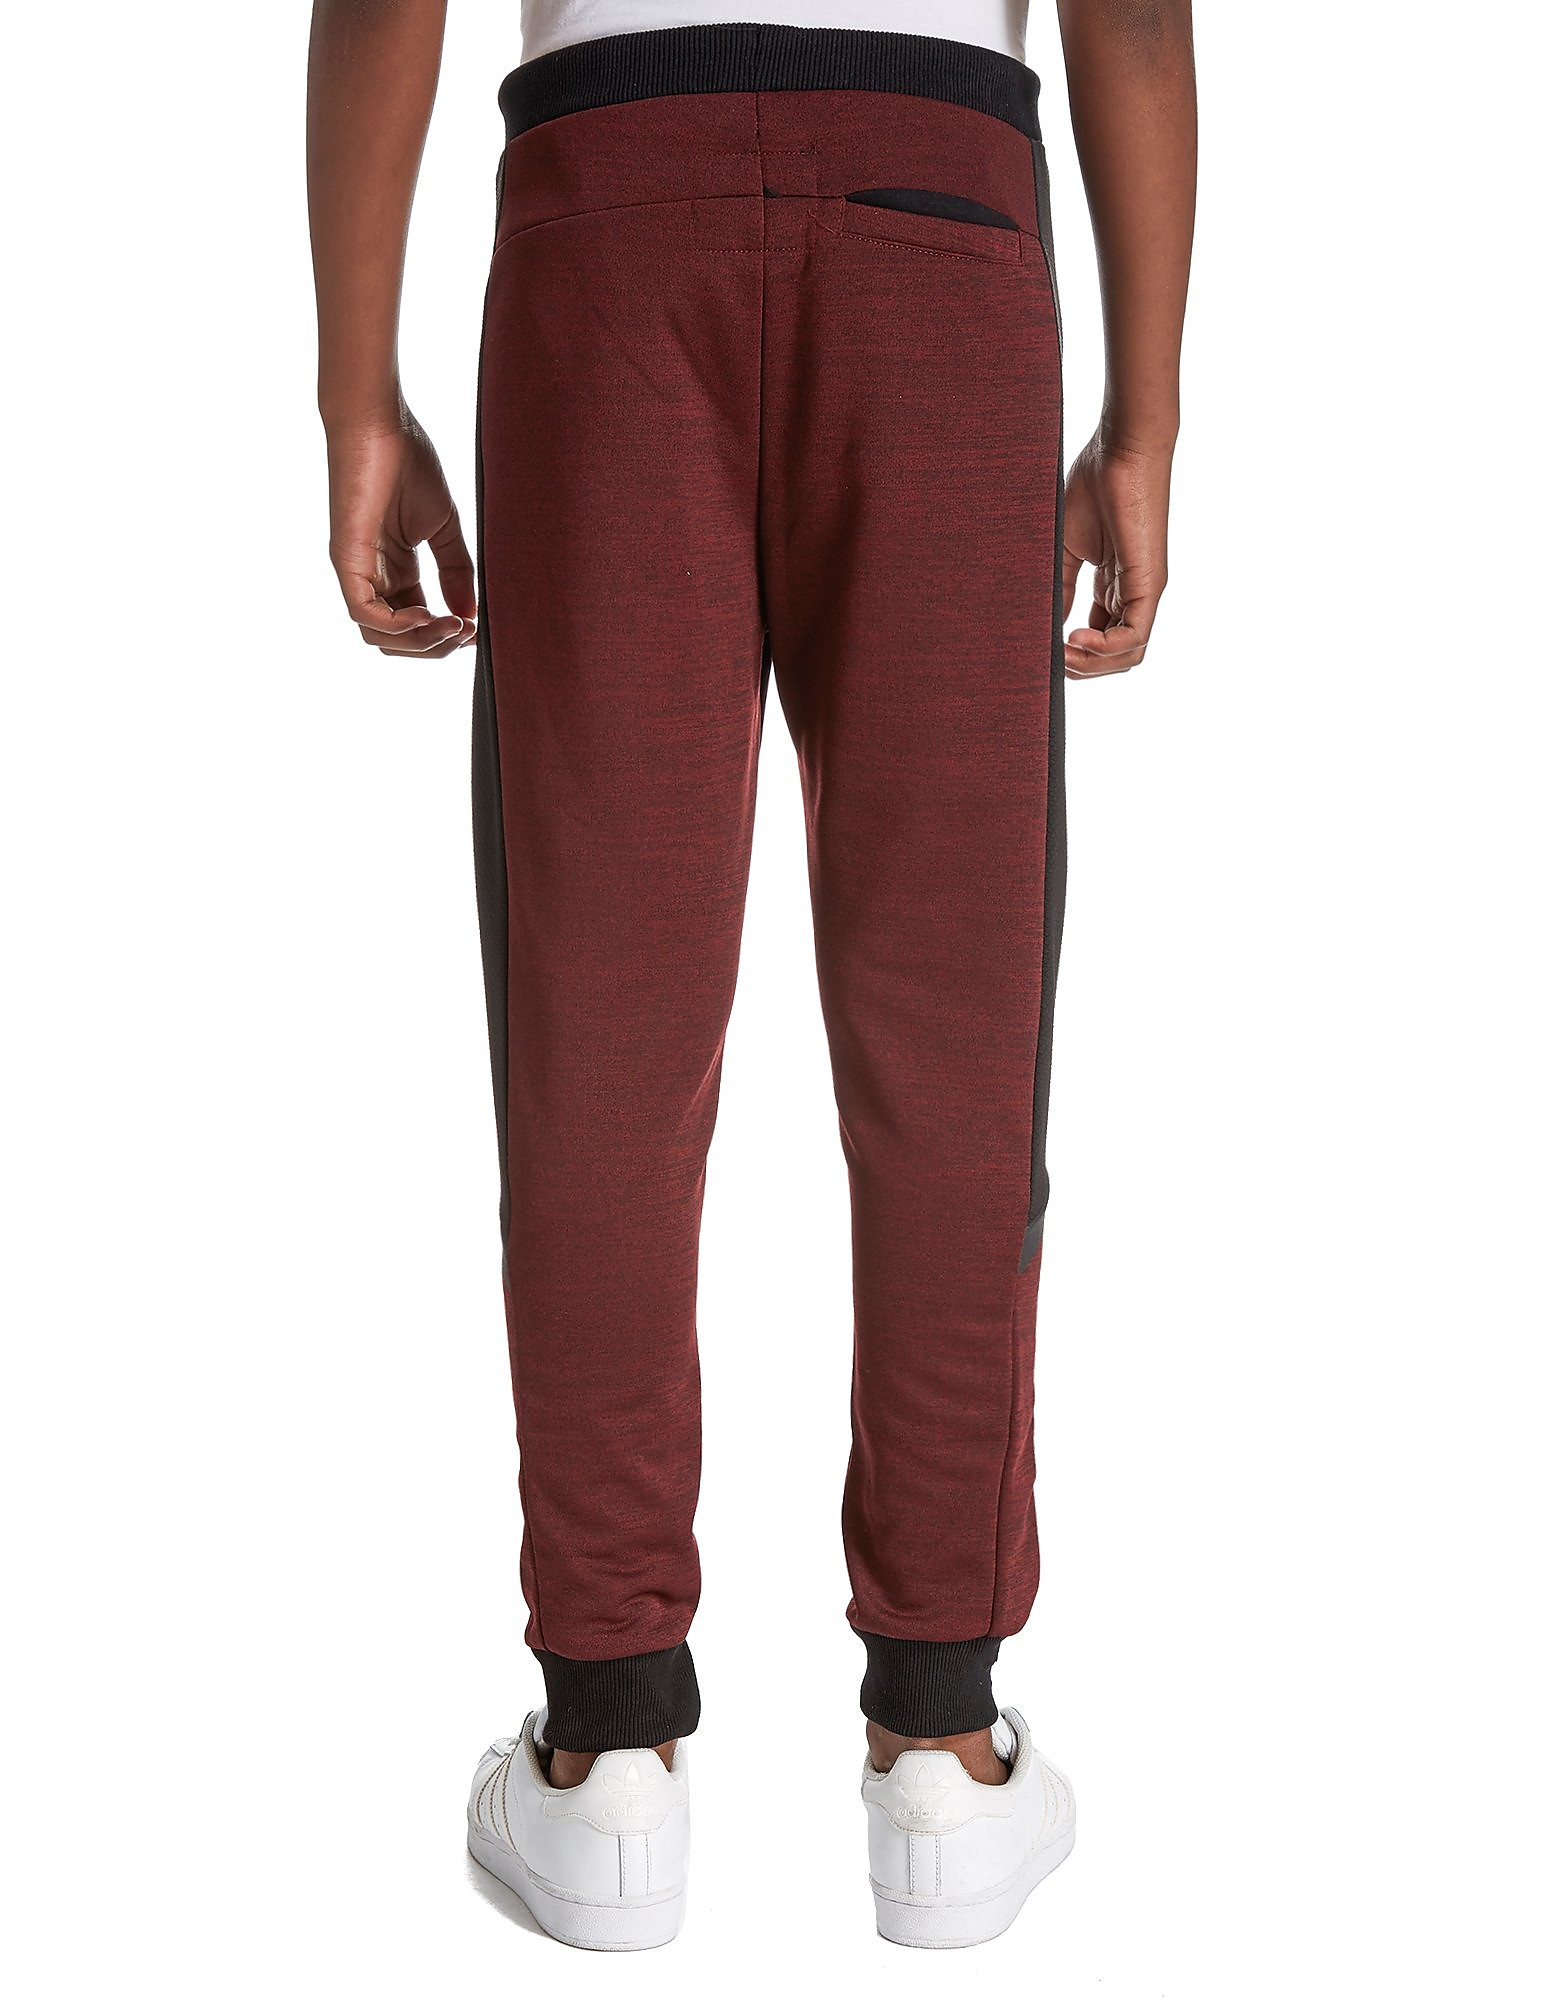 Sonneti Hydro Pants Junior